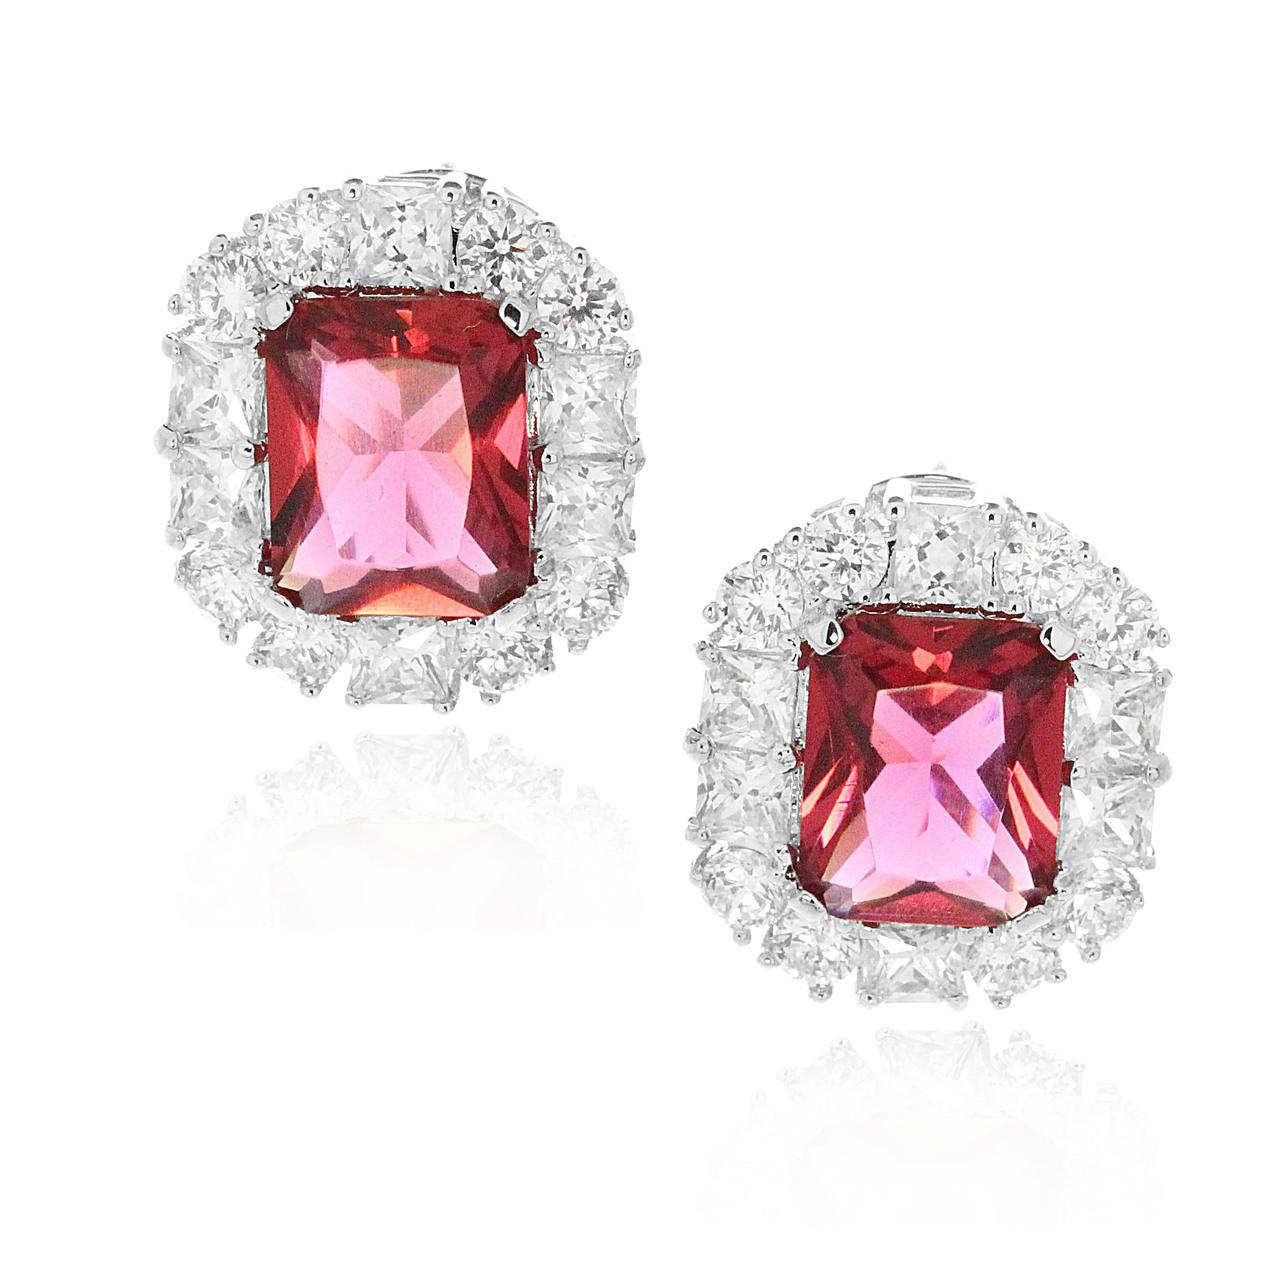 Engagement, Halo Bridal Stud Earrings Cushion Cut 2.00 CT Rainbow Fire Topaz CZ Round Simulated Diamond 925 Sterling Silver Wedding